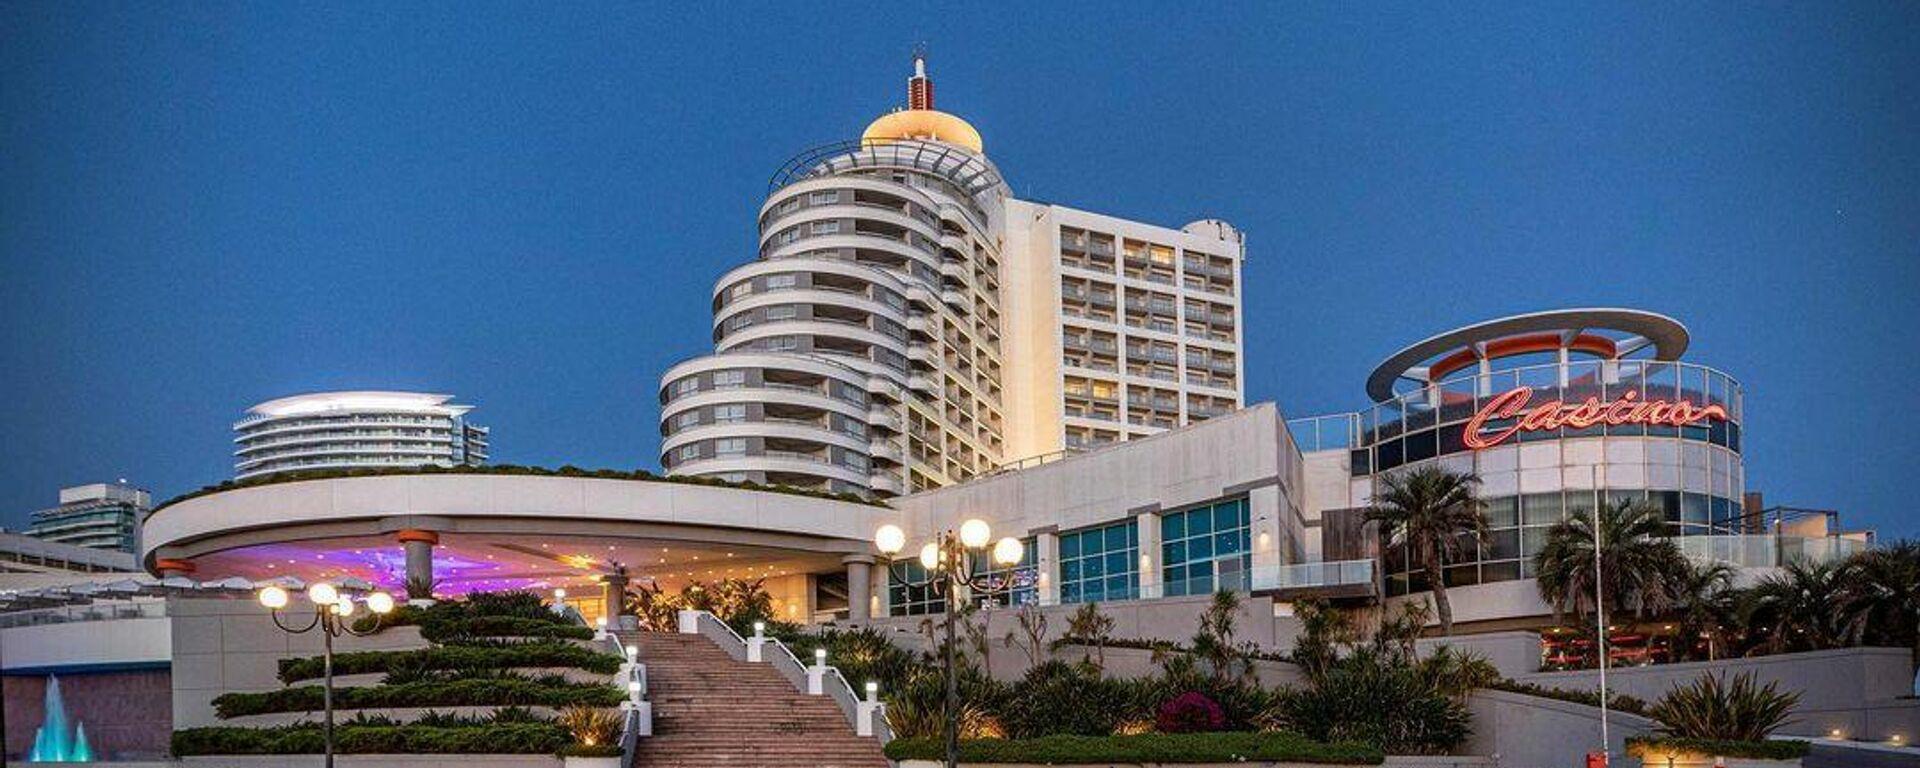 Hotel Enjoy en Punta del Este, Uruguay - Sputnik Mundo, 1920, 13.10.2021